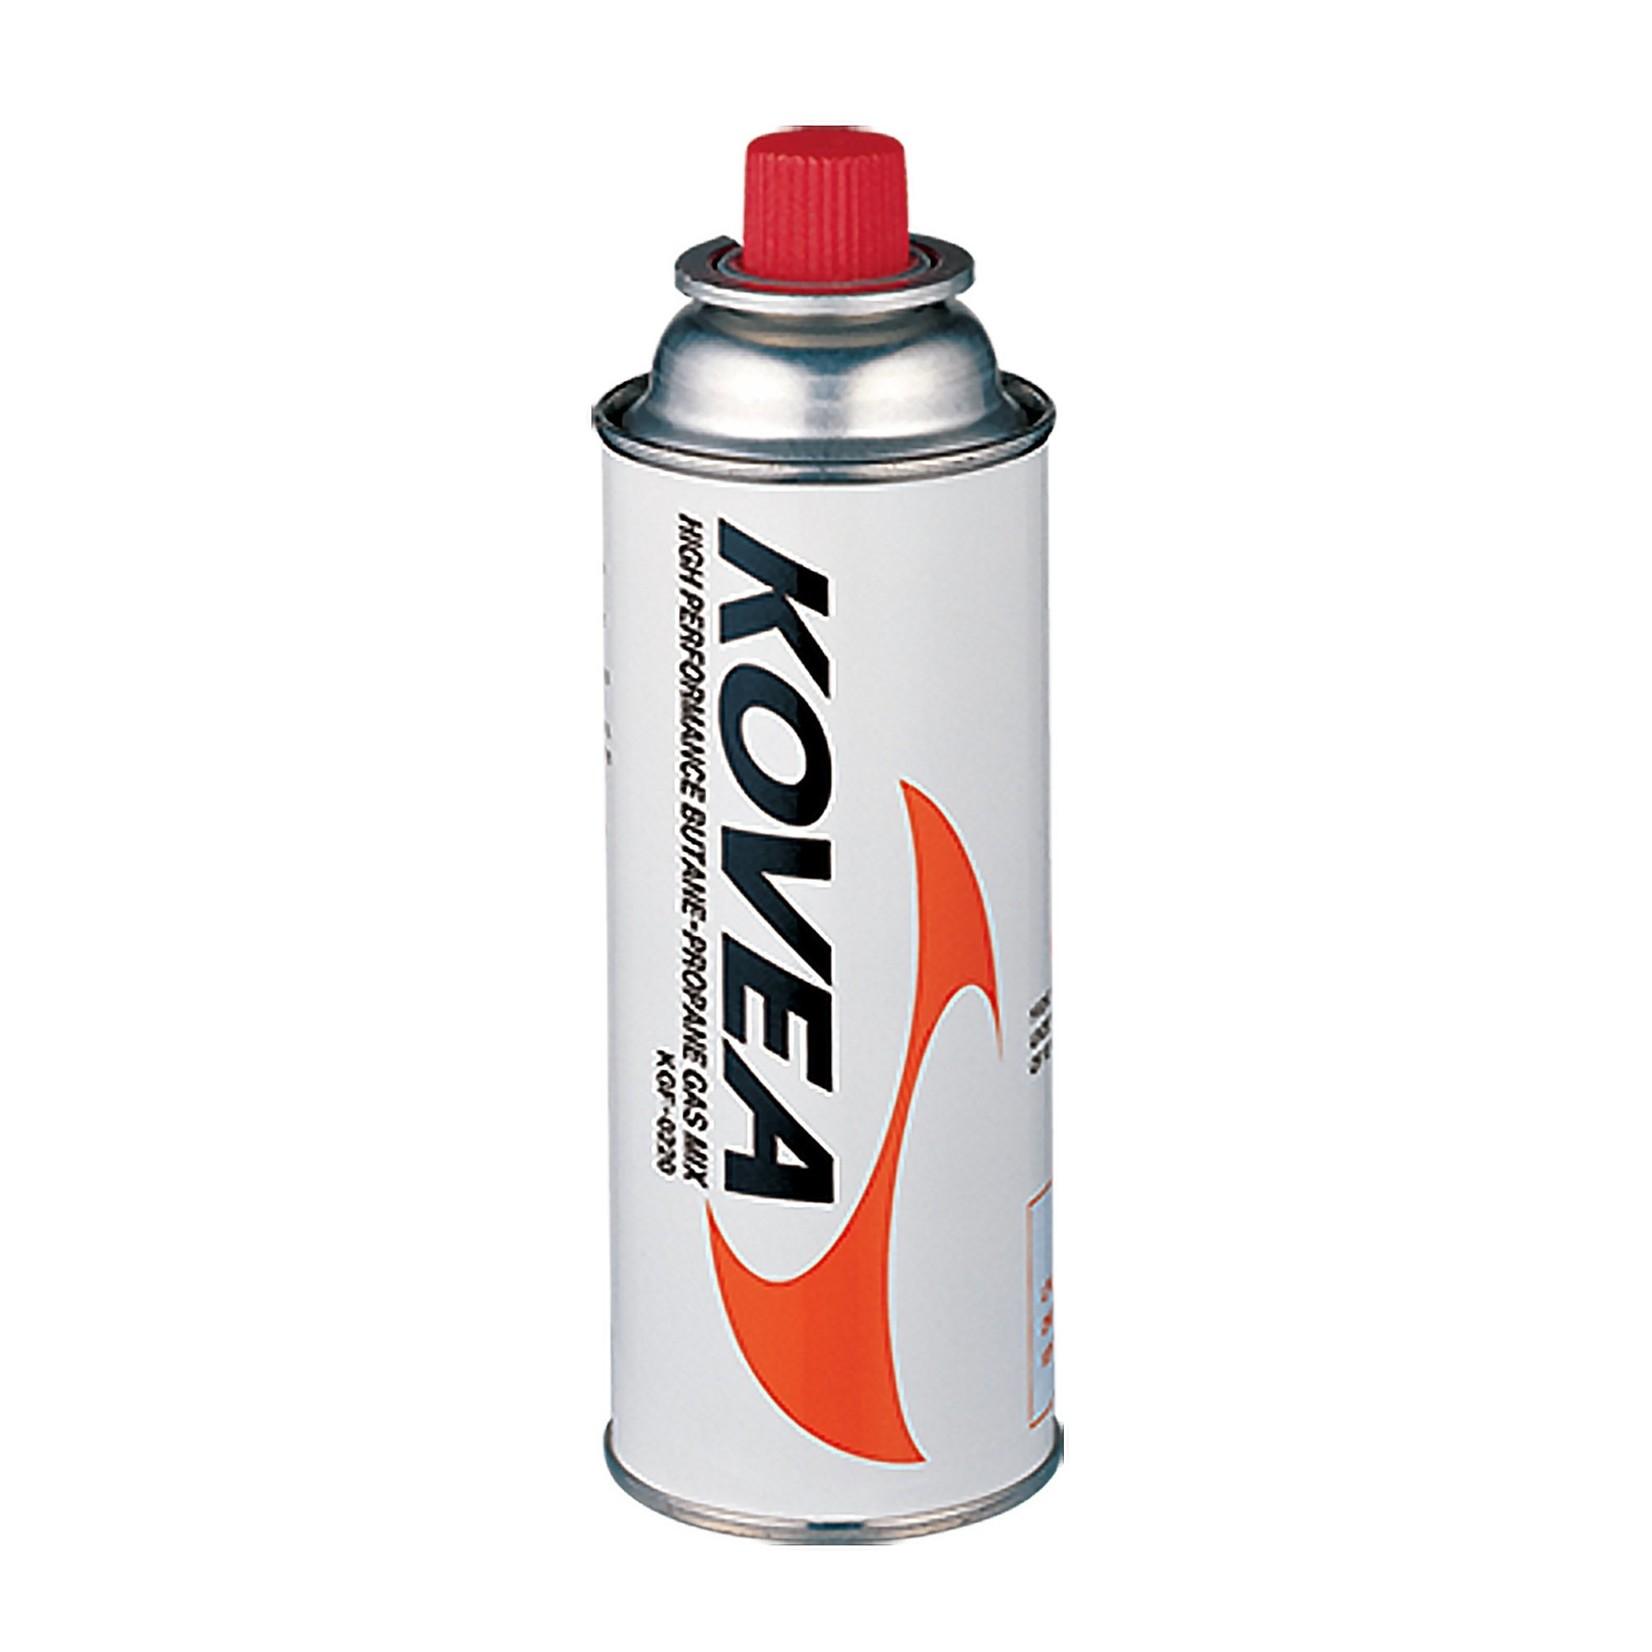 Kovea 227g Nozzle Style Butane Gas Canister